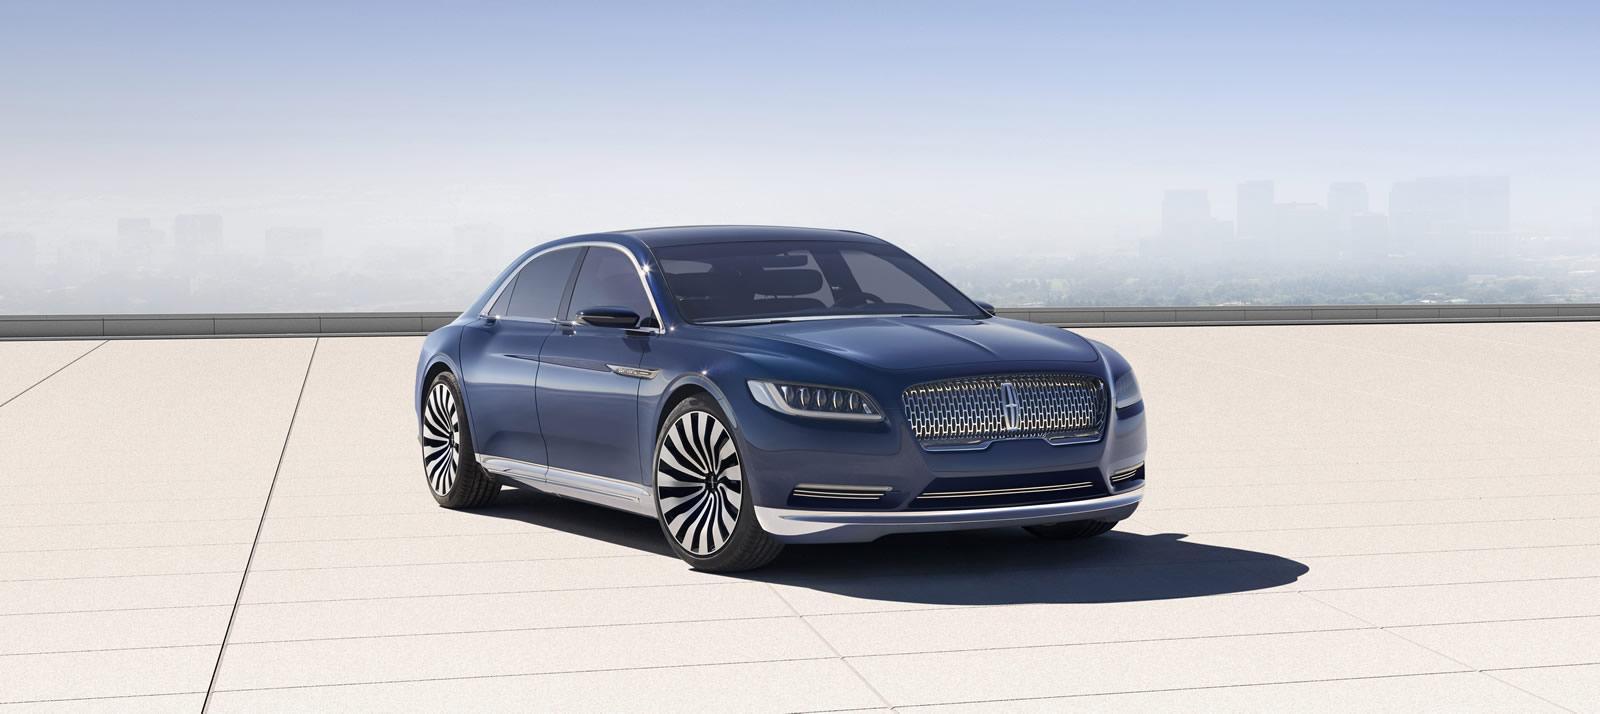 2015_Lincoln_Continental_Concept_10